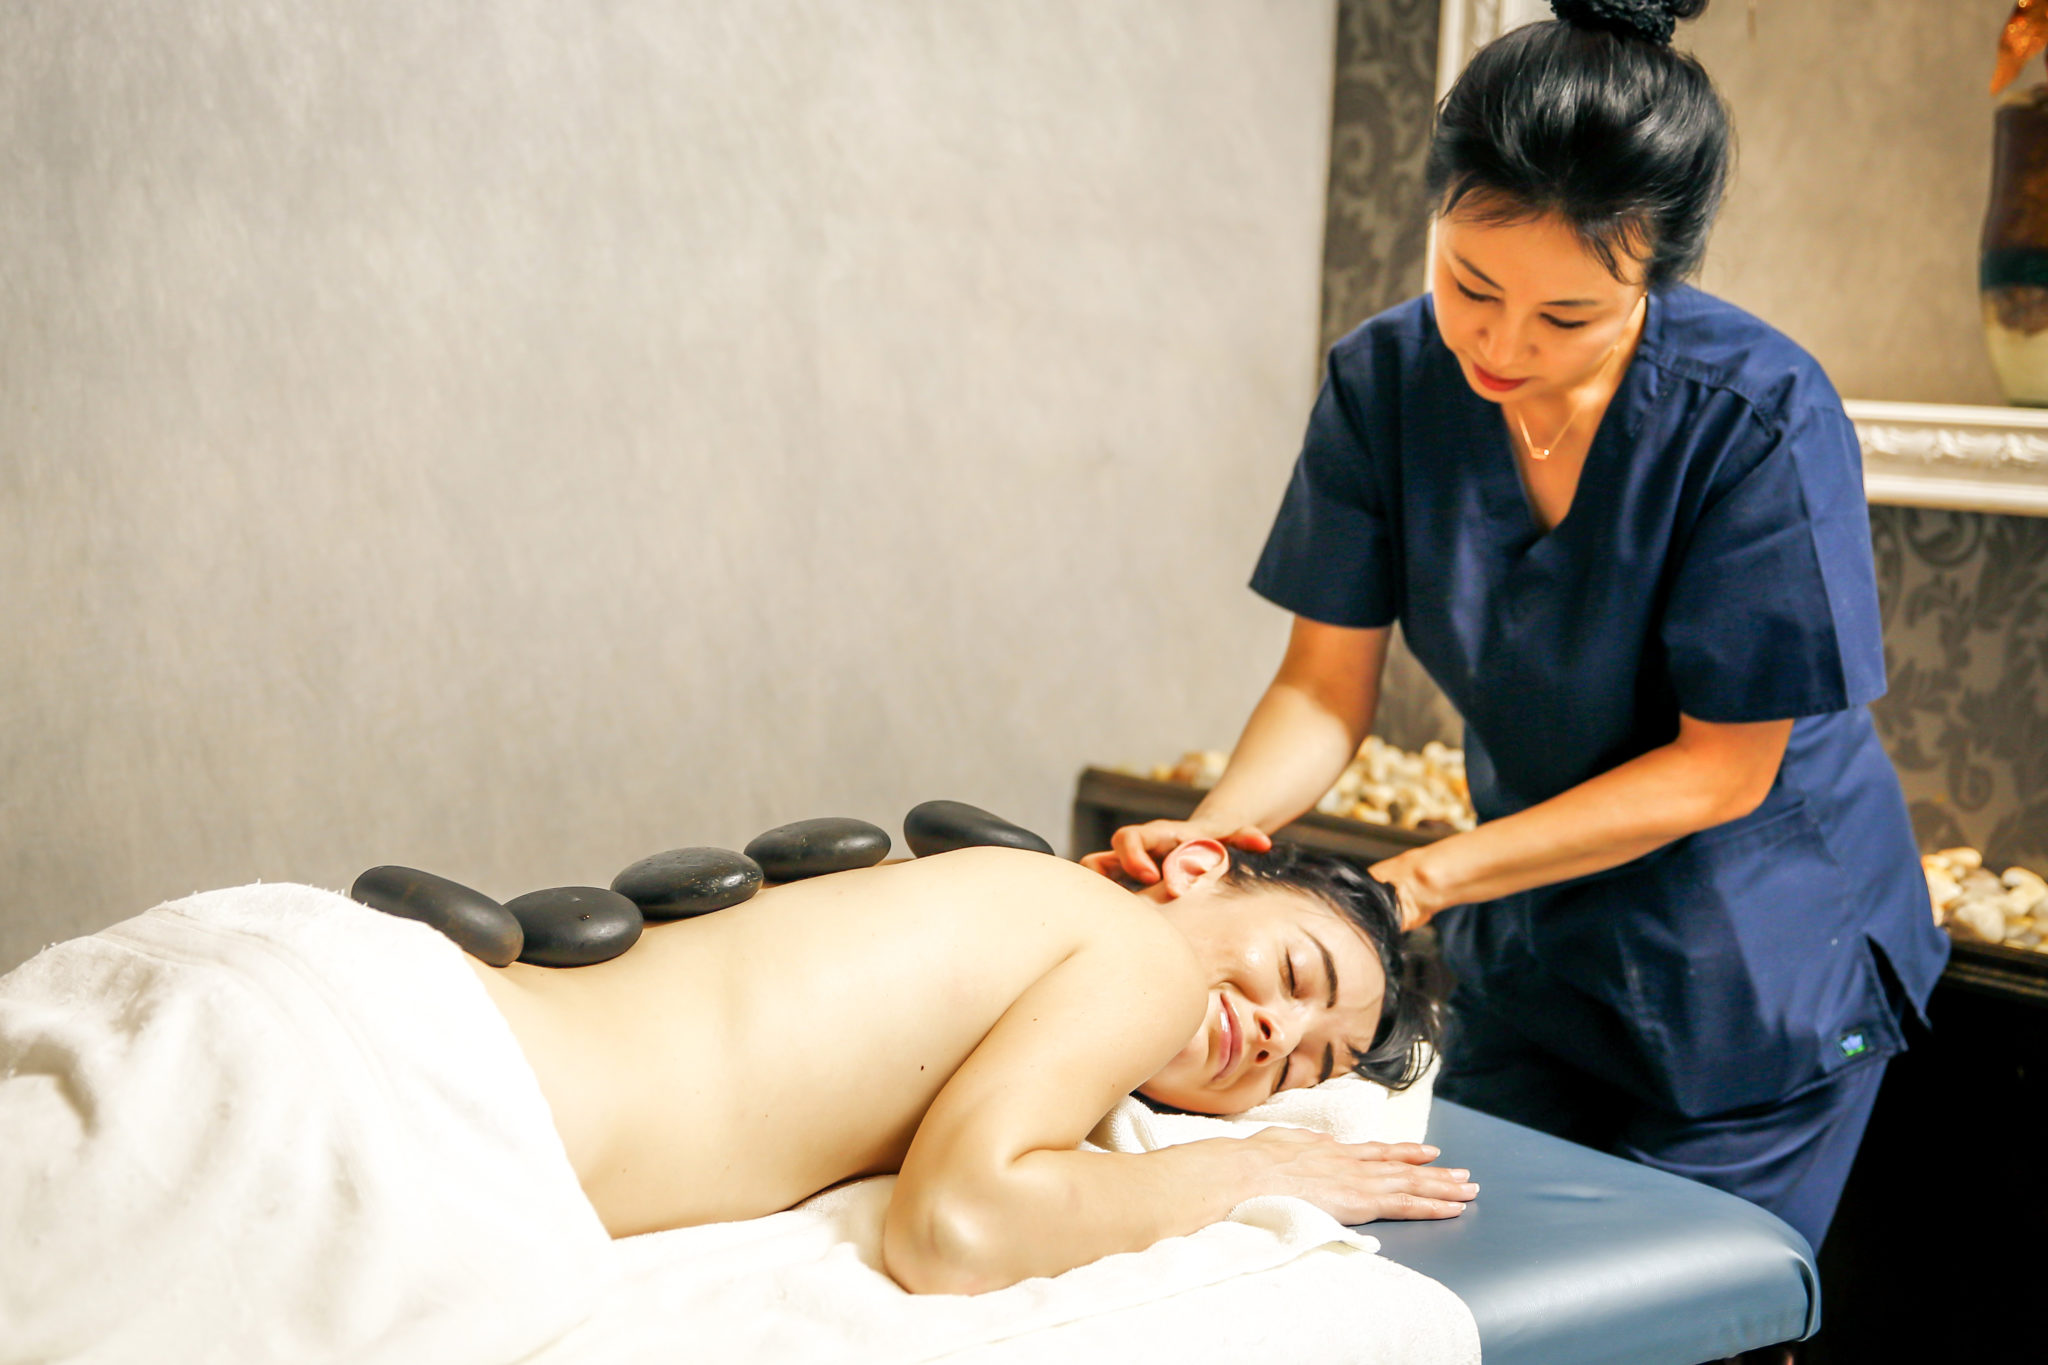 Thermo-Stone Therapy, Reflexology Massage, Mosht-O-Maul (Sports Massage), Express Massage, Four Hands Dream Massage in New York City NYC Manhattan.